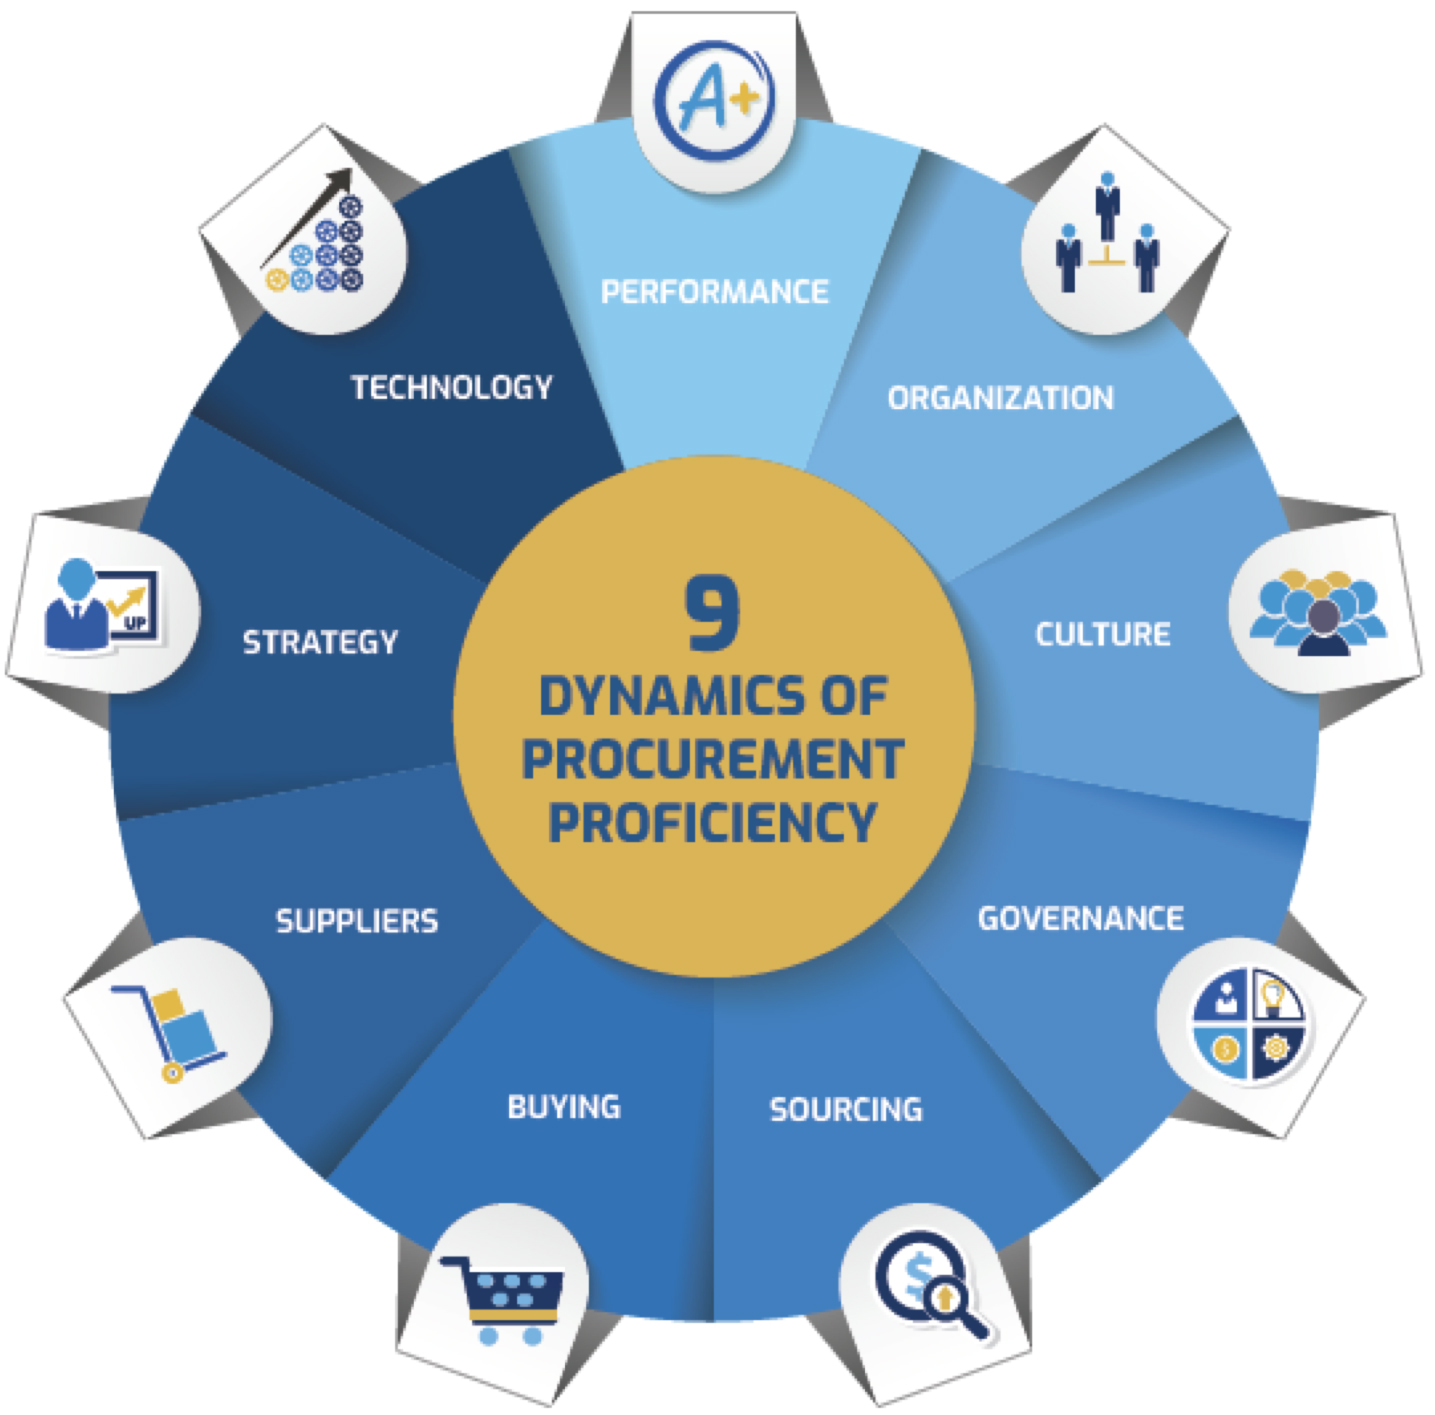 The Nine Dynamics of Procurement Proficiency copy